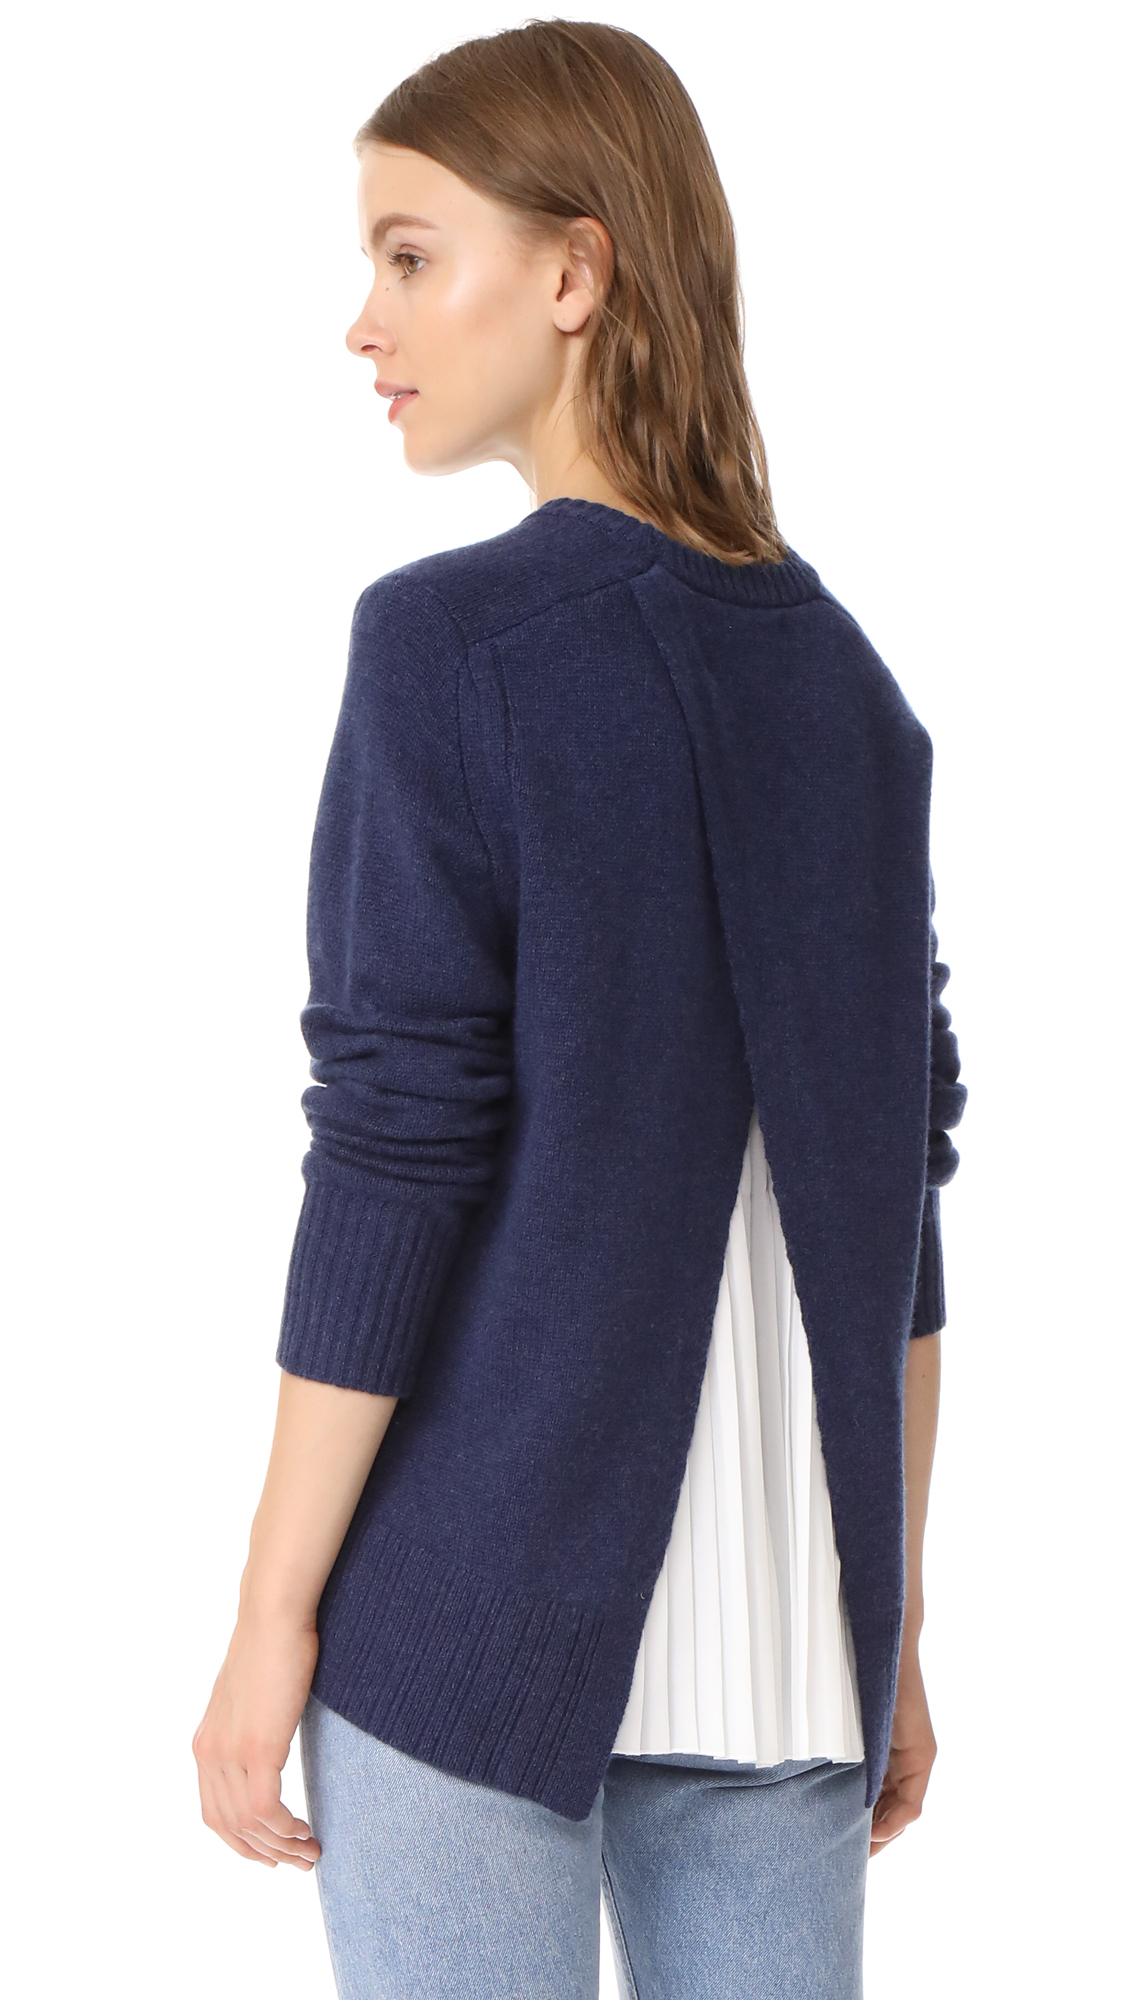 Brochu Walker Keller Layered Pullover - Indigo With White Underlay